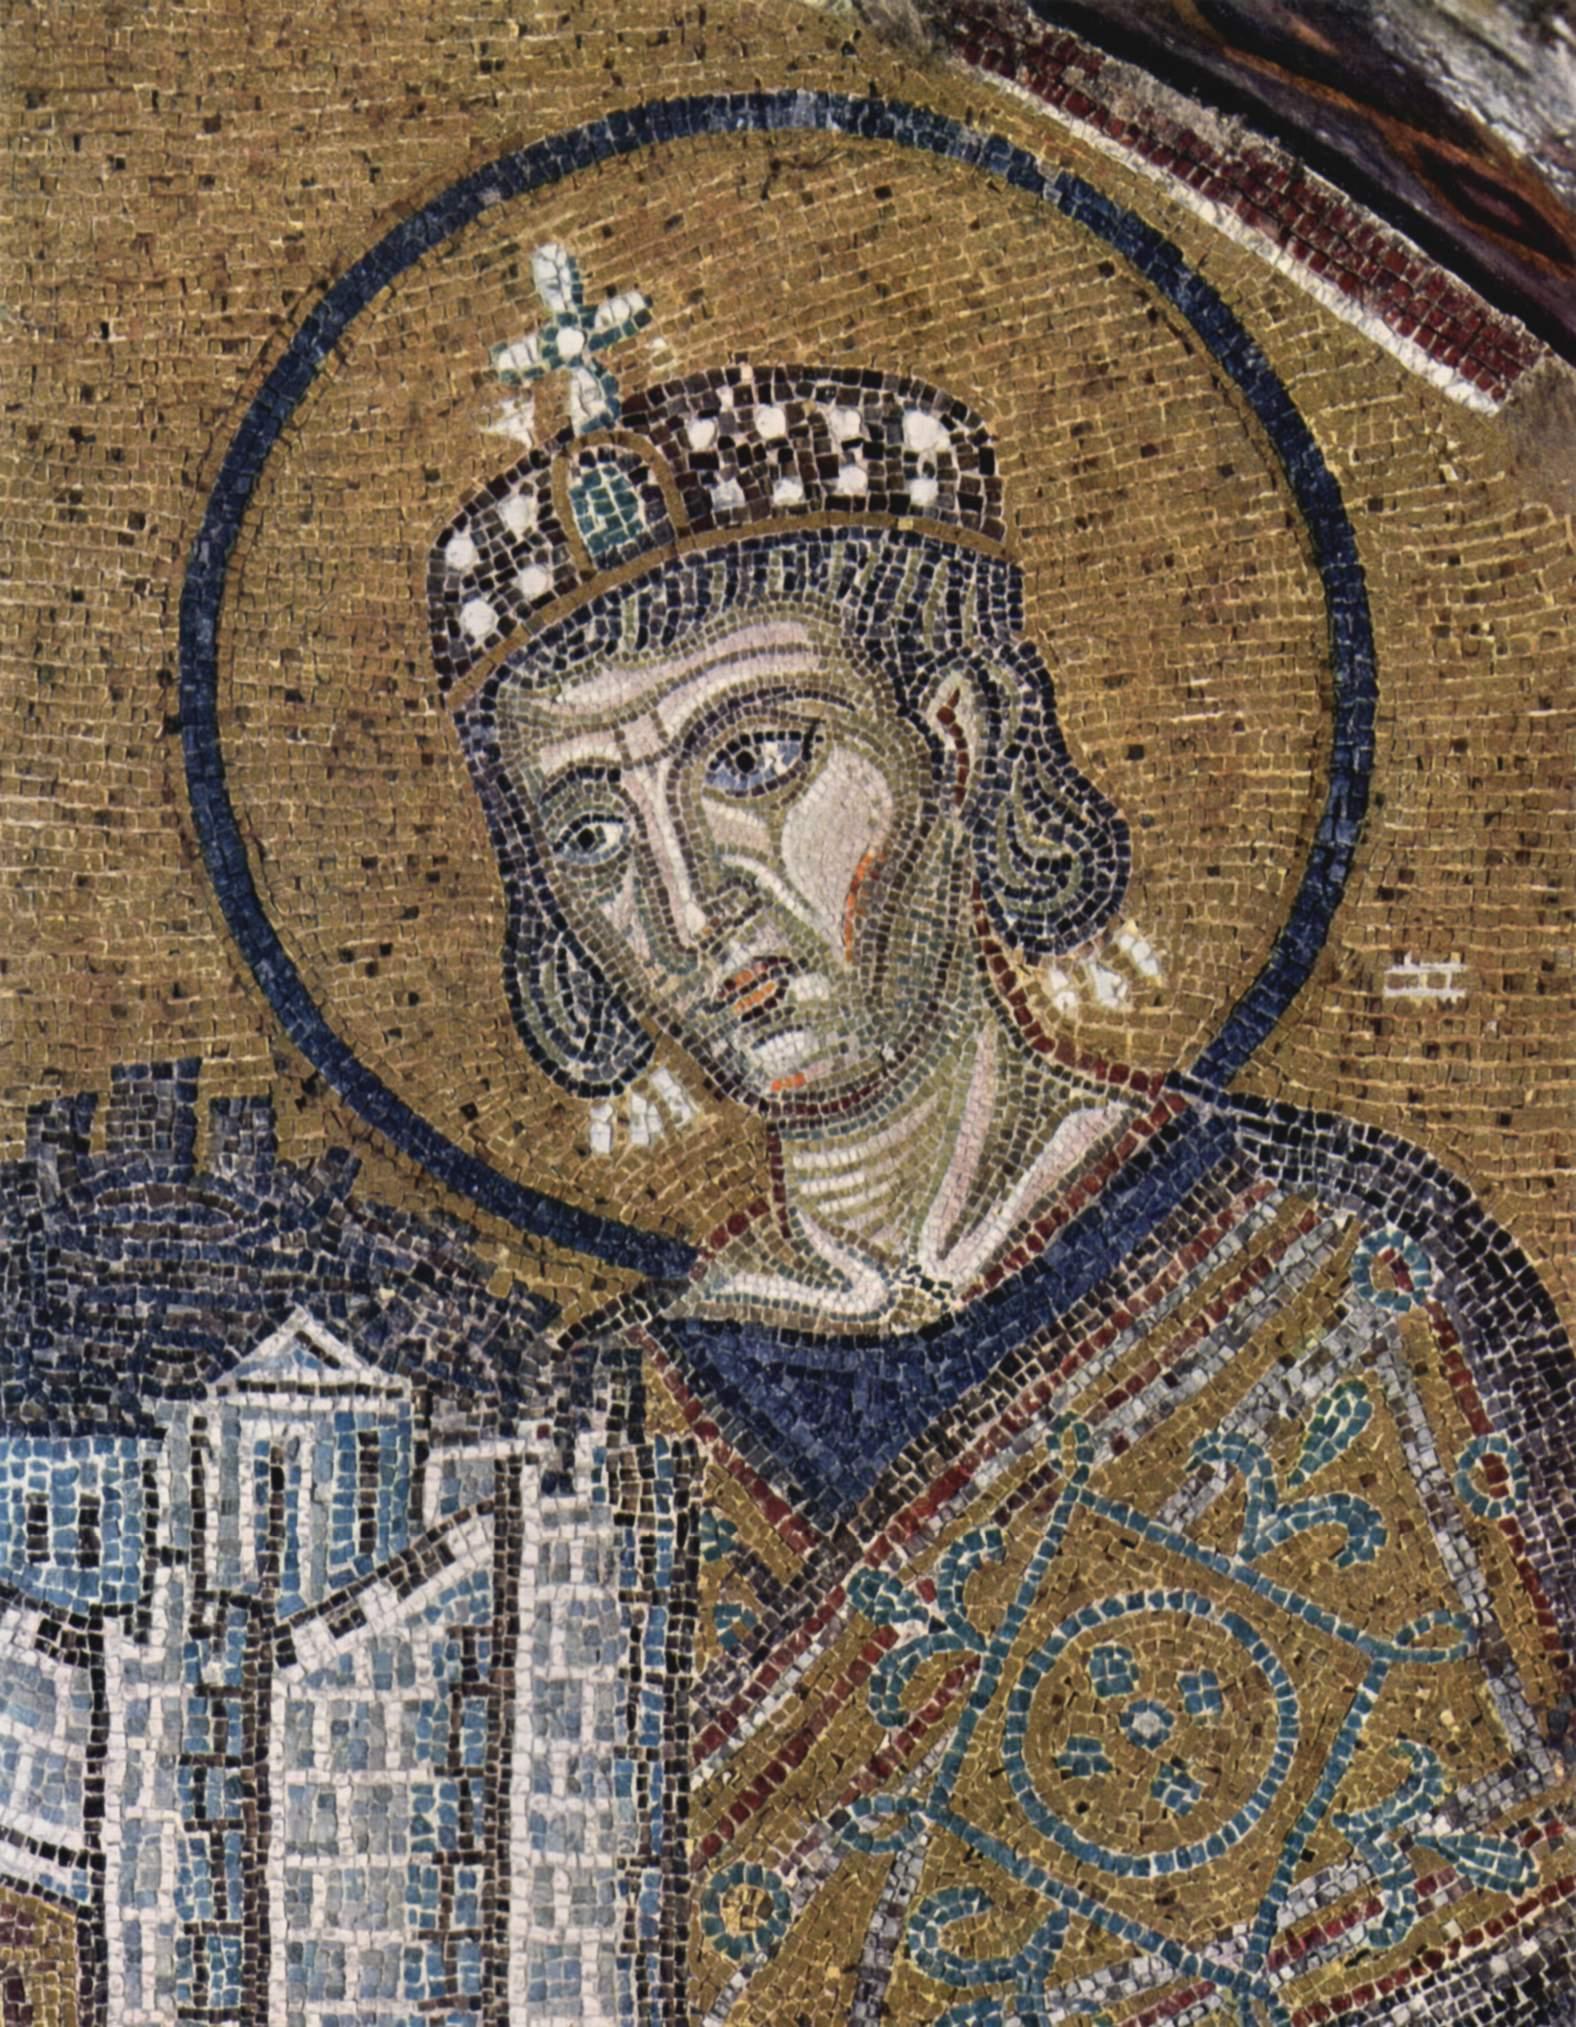 http://upload.wikimedia.org/wikipedia/commons/3/3e/Byzantinischer_Mosaizist_um_1000_002.jpg